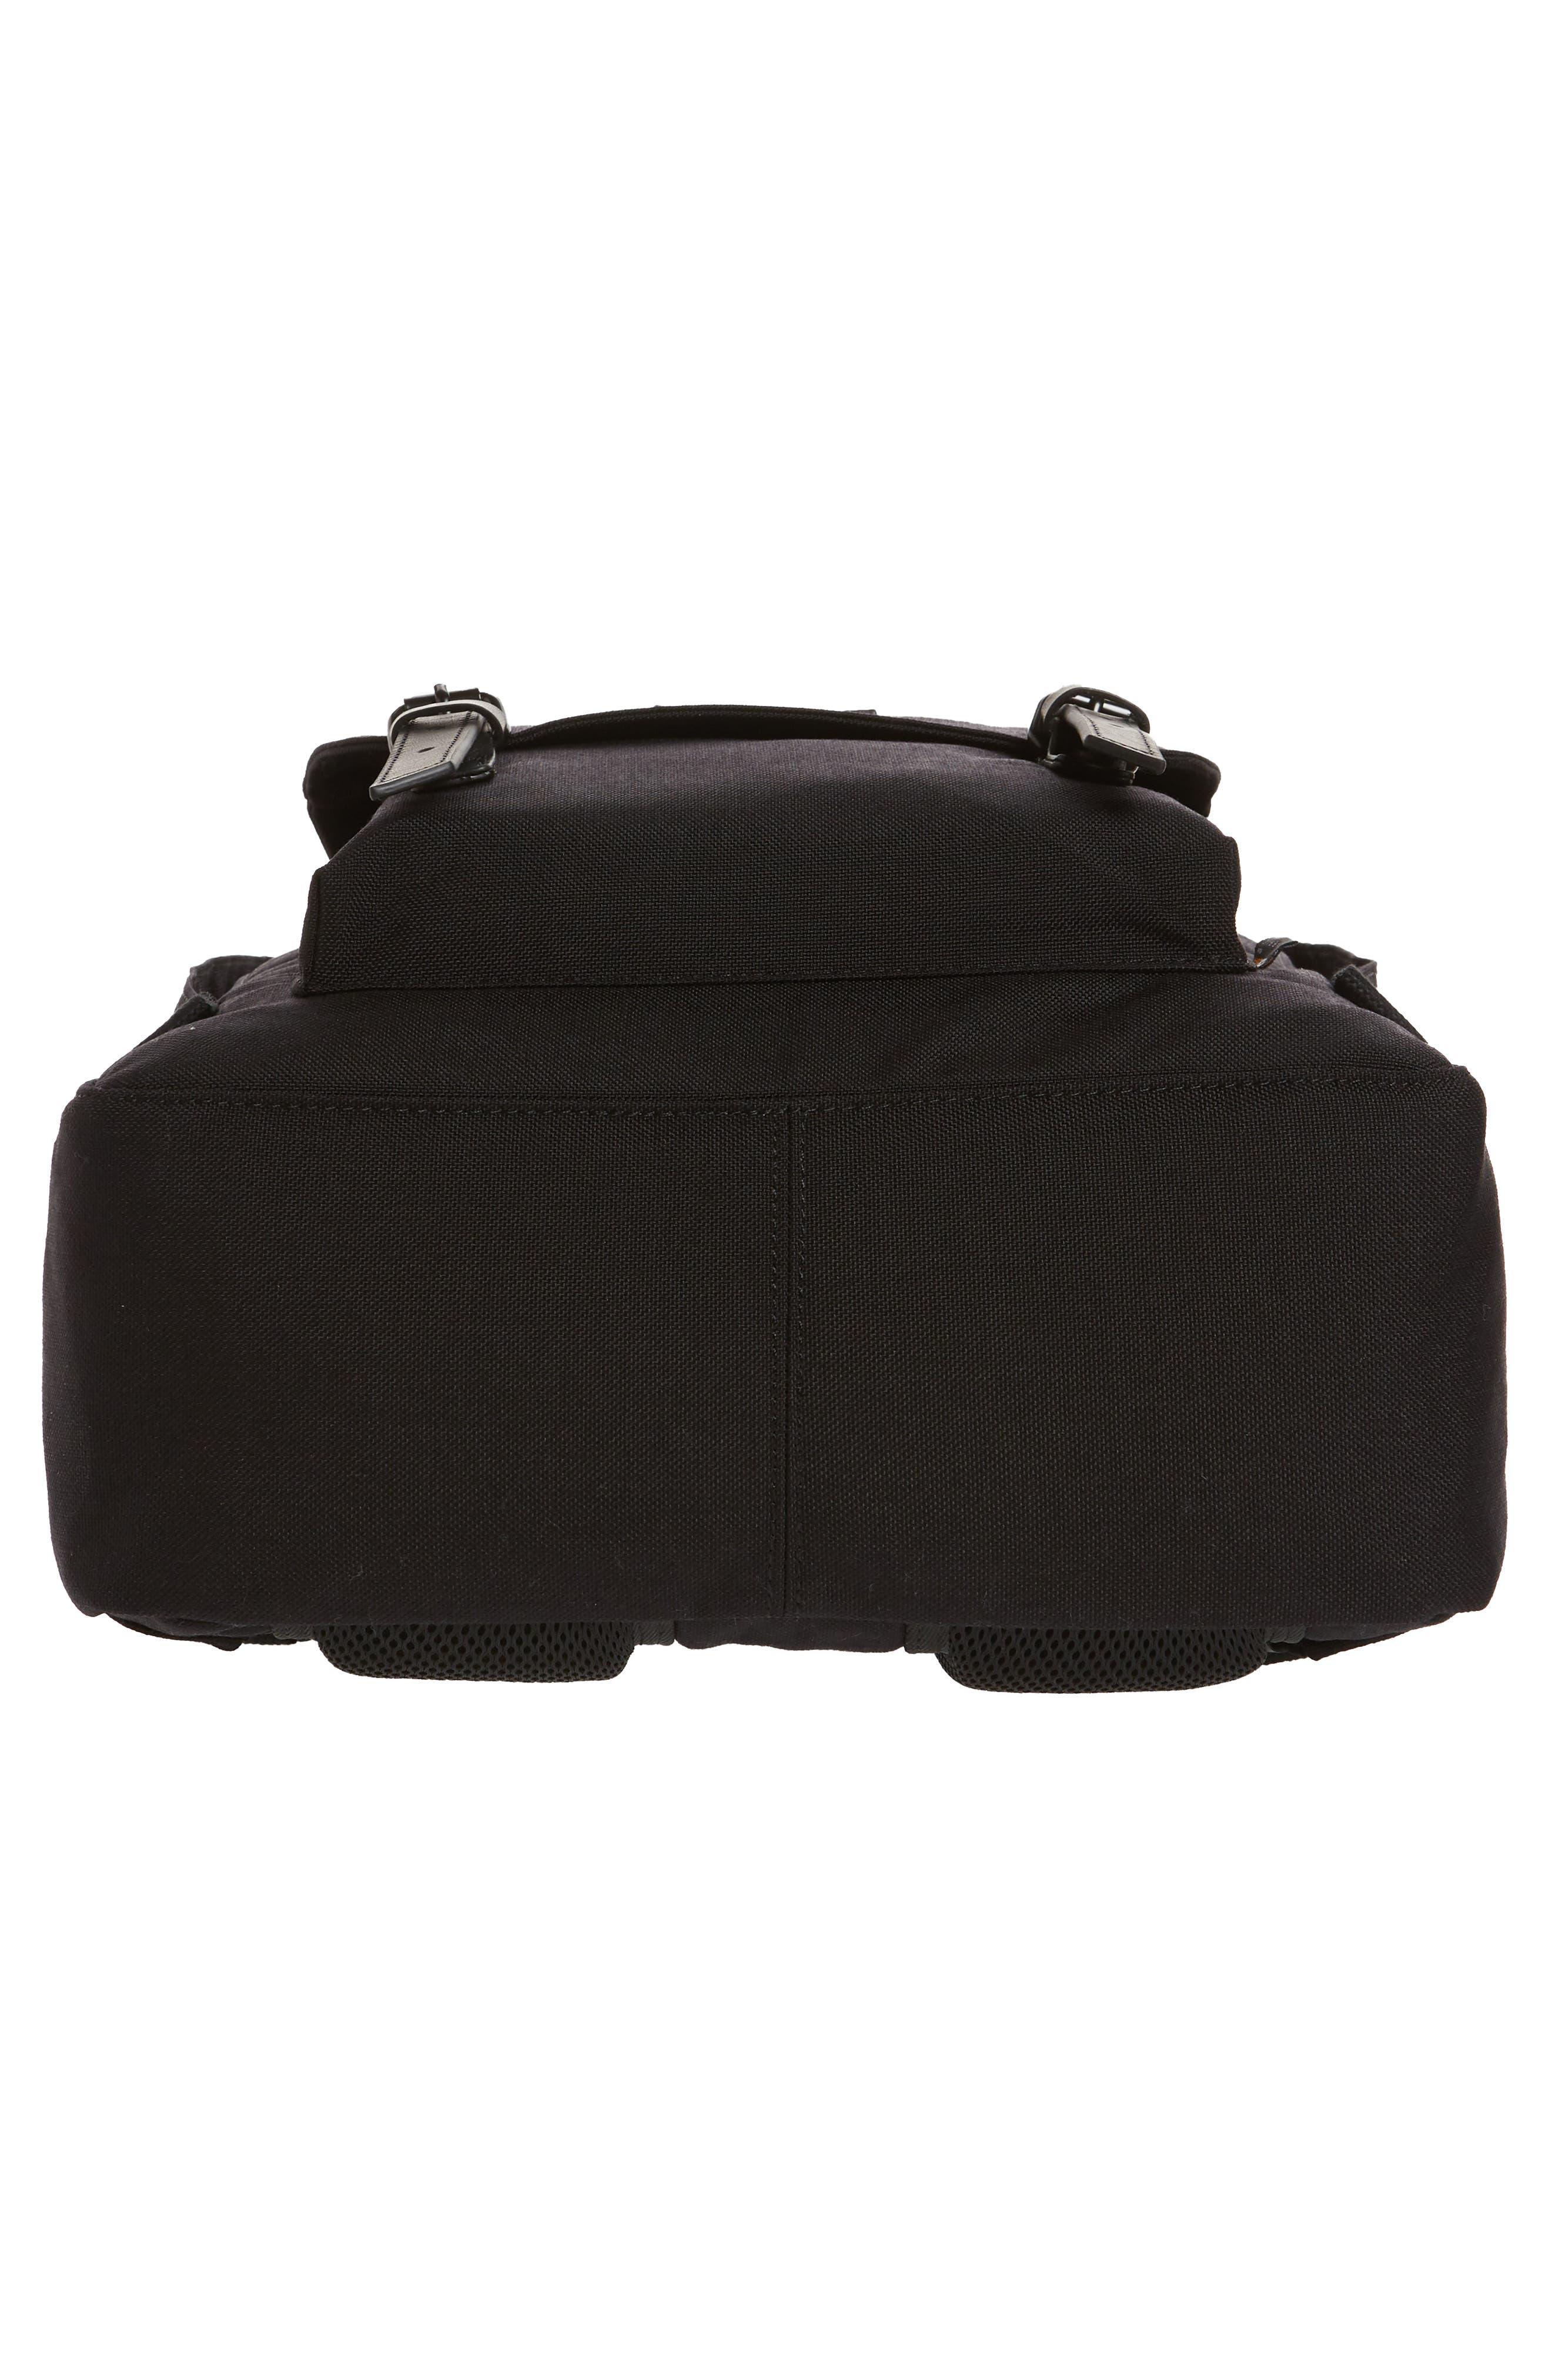 Macaroon Large Cordura<sup>®</sup> Black Series Water Repellent Backpack,                             Alternate thumbnail 6, color,                             001